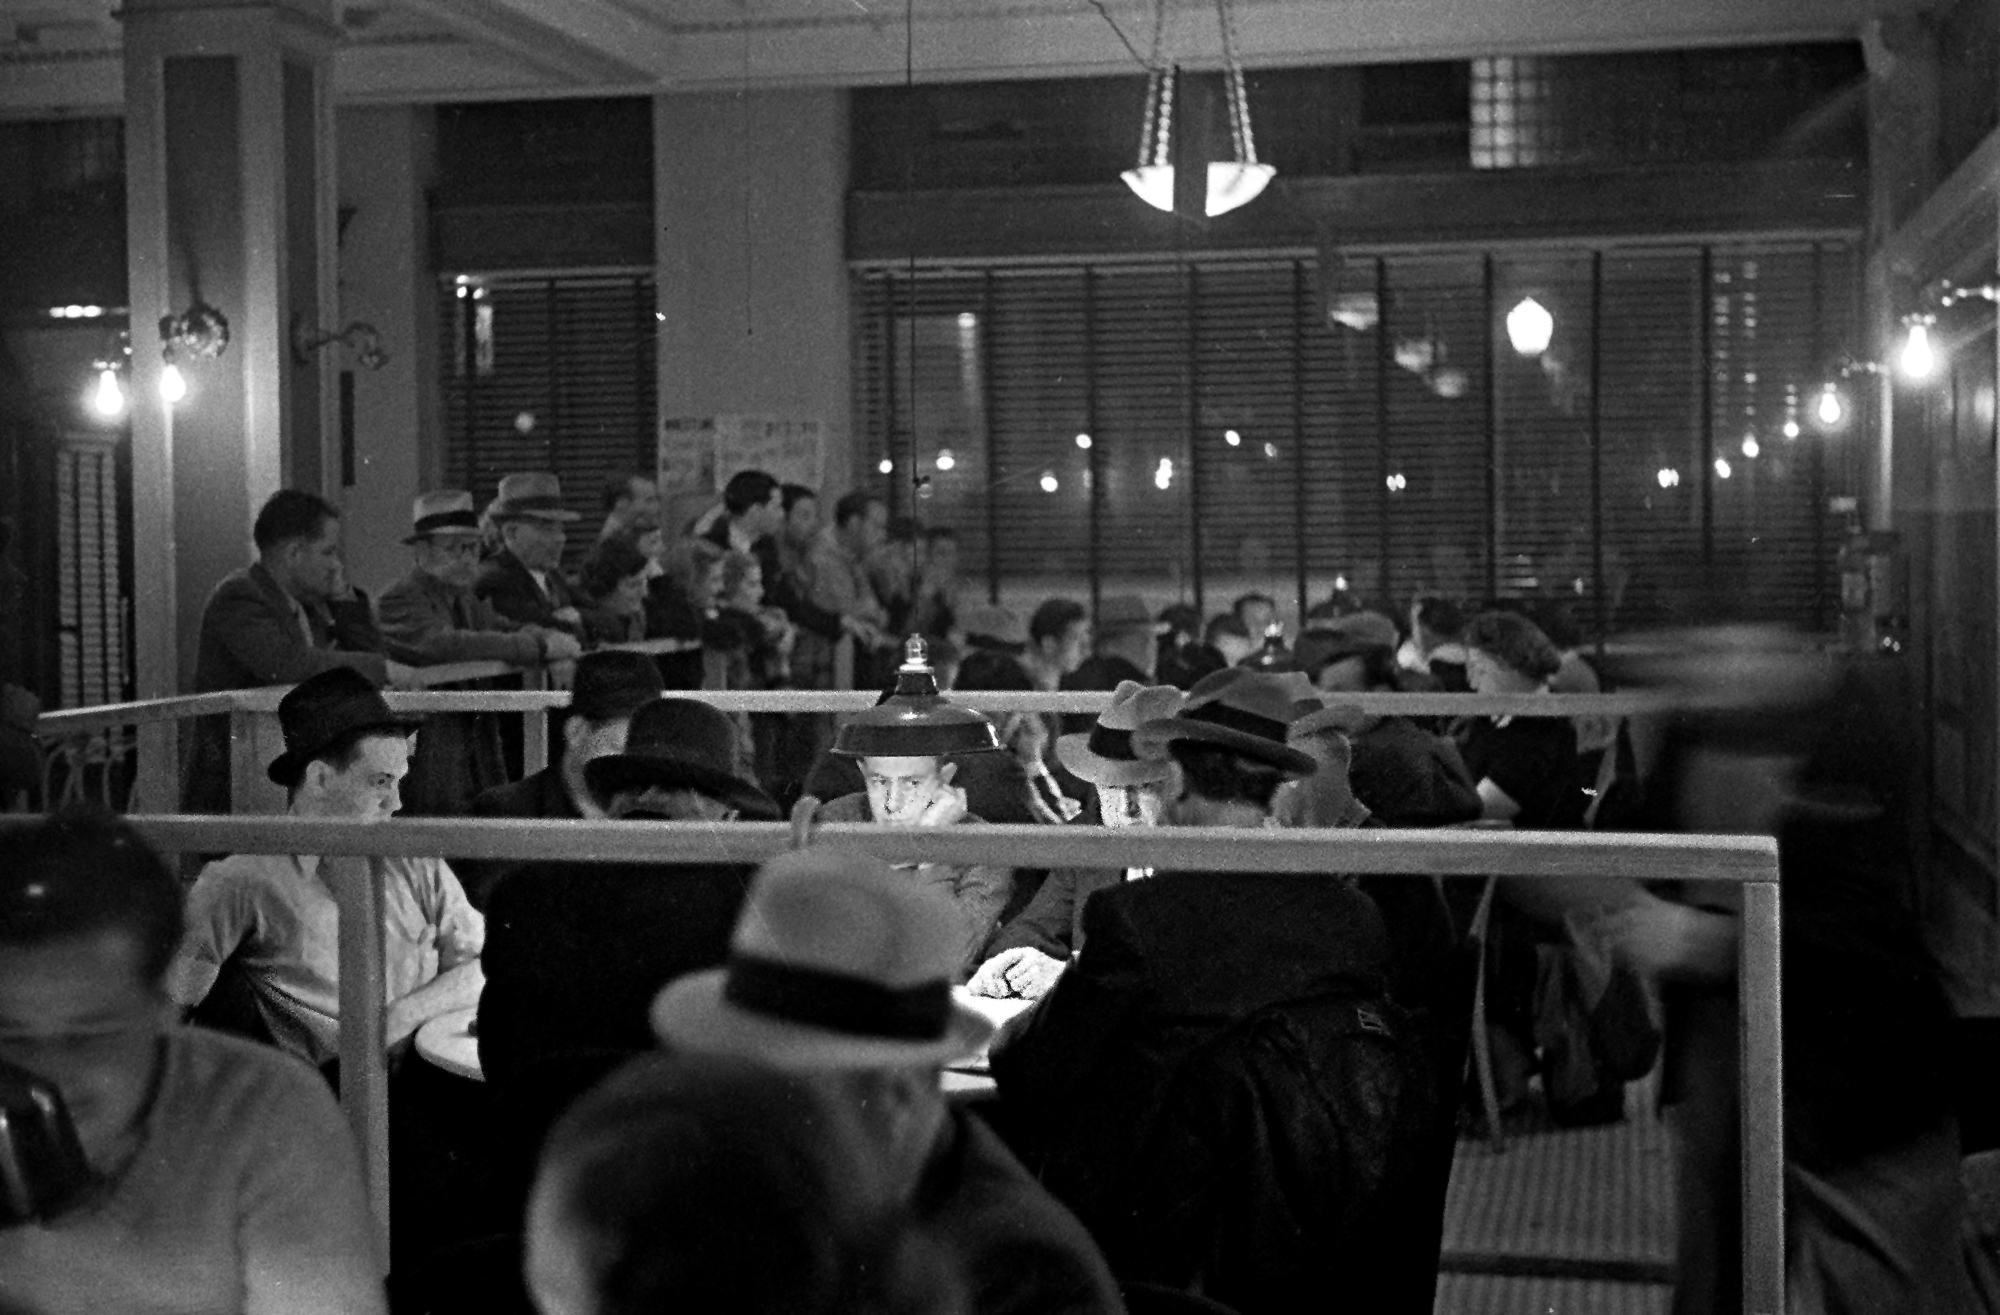 Ruang kartu California berkembang pesat pada tahun 1930-an.